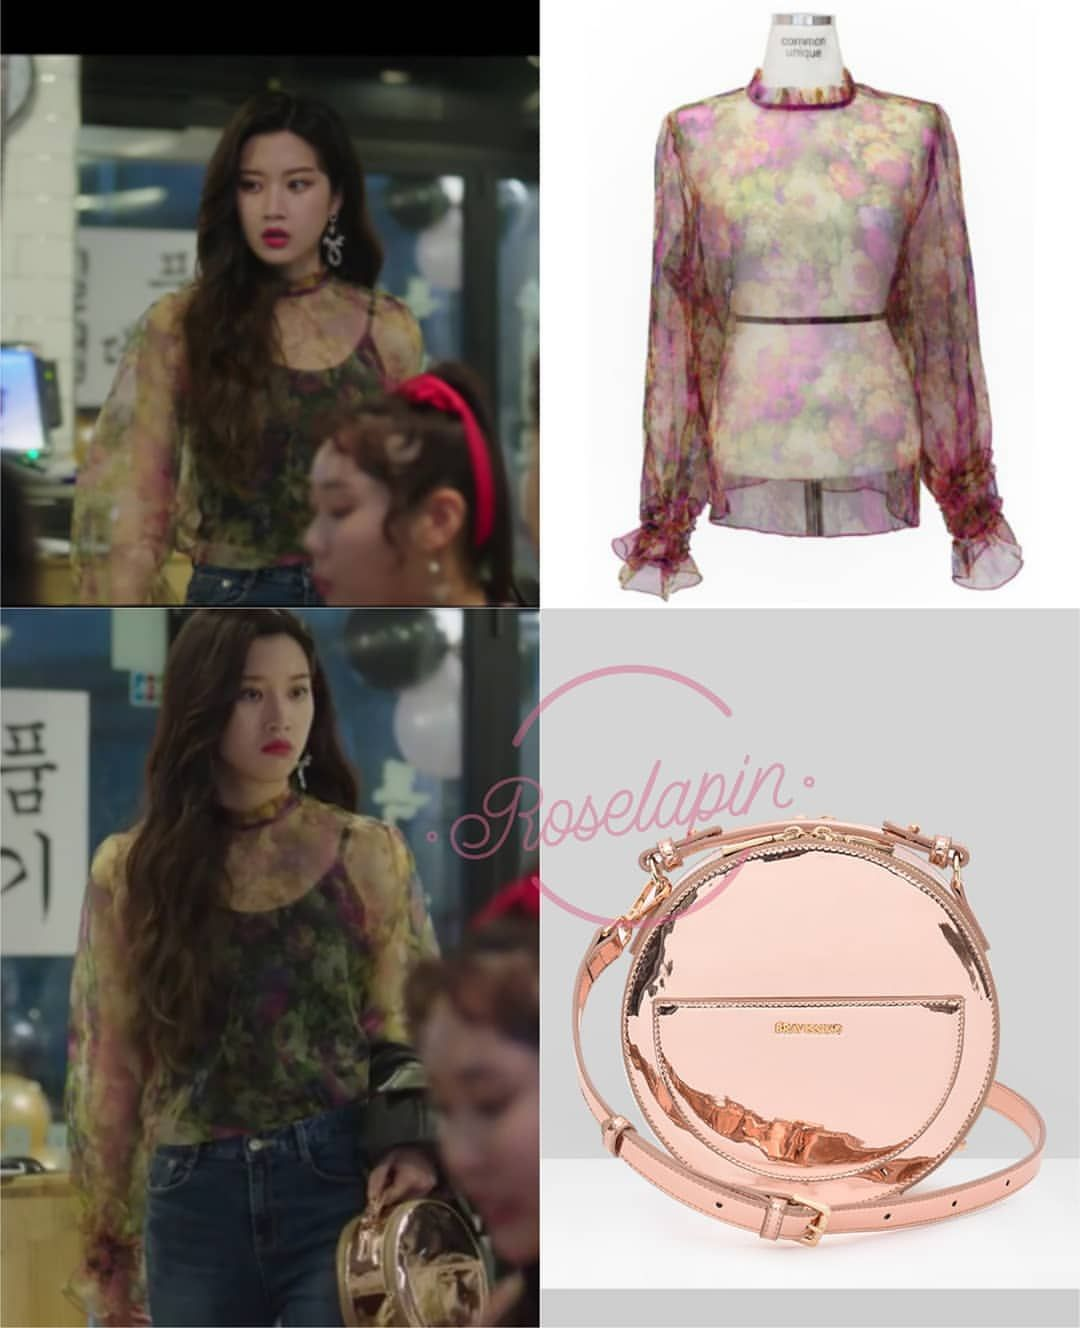 Moon Gayoung Tempted Commonunique See Through Blouse 39 800 Bravissimo Bag 95 000 Korean Fashion Drama Clothes Young Fashion